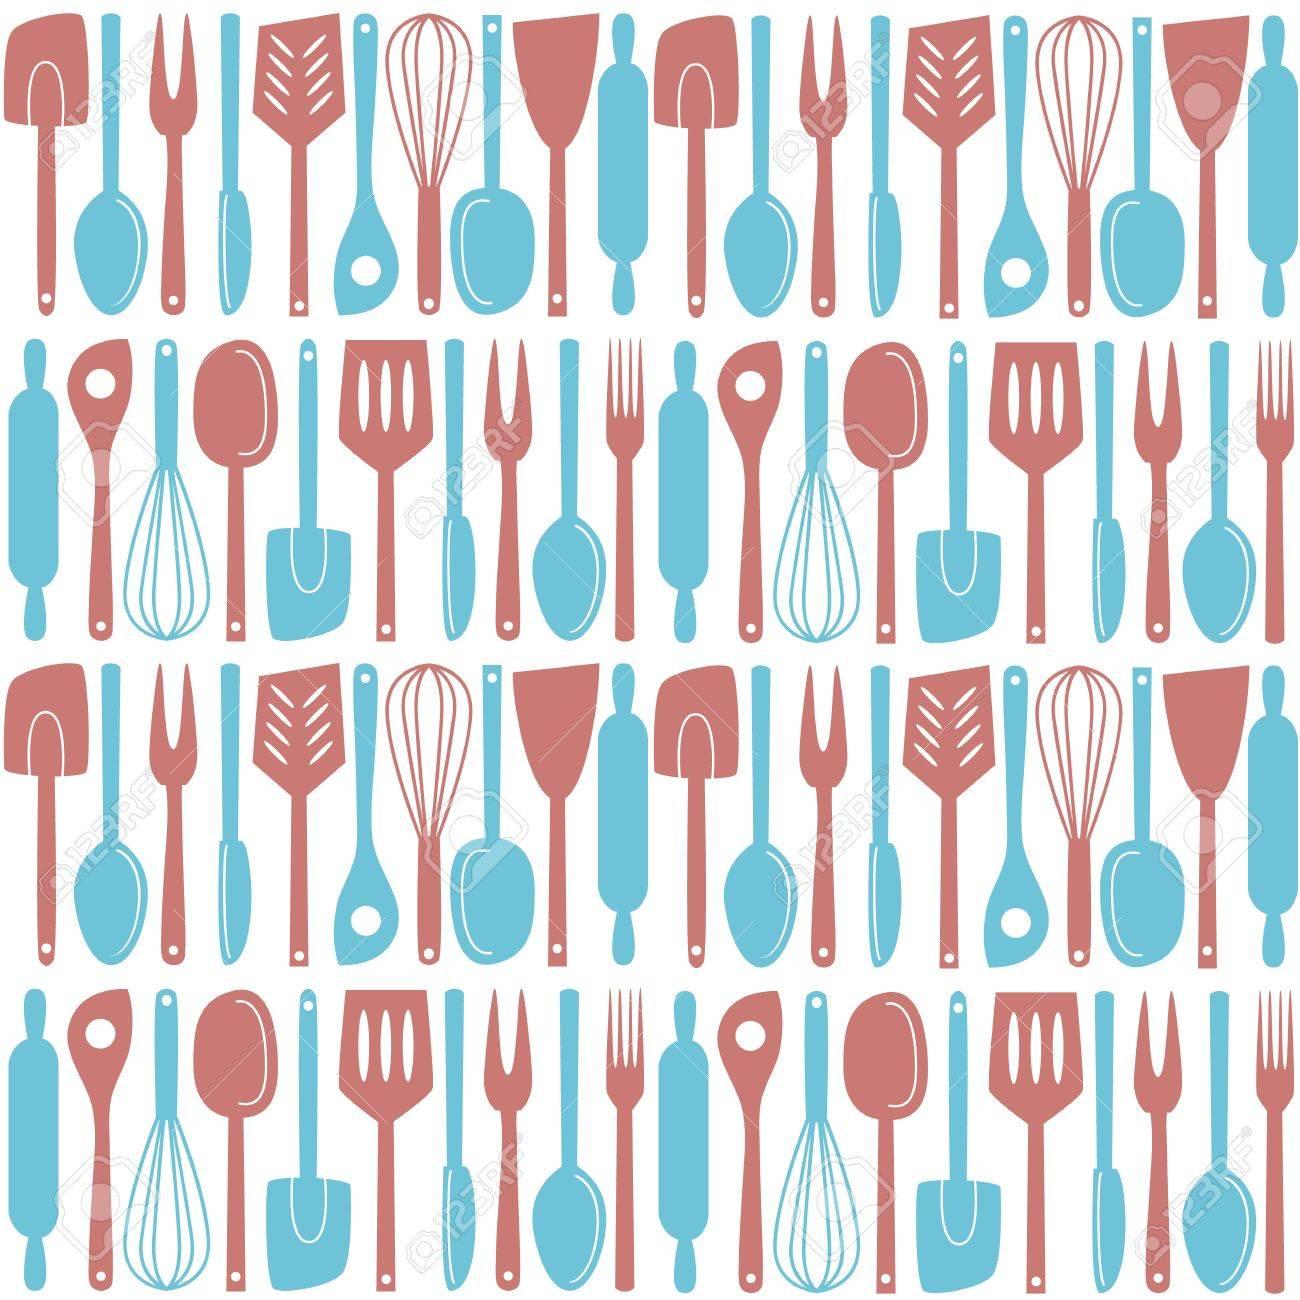 Illustration of kitchen utensils and cutlery, seamless pattern - 19379304